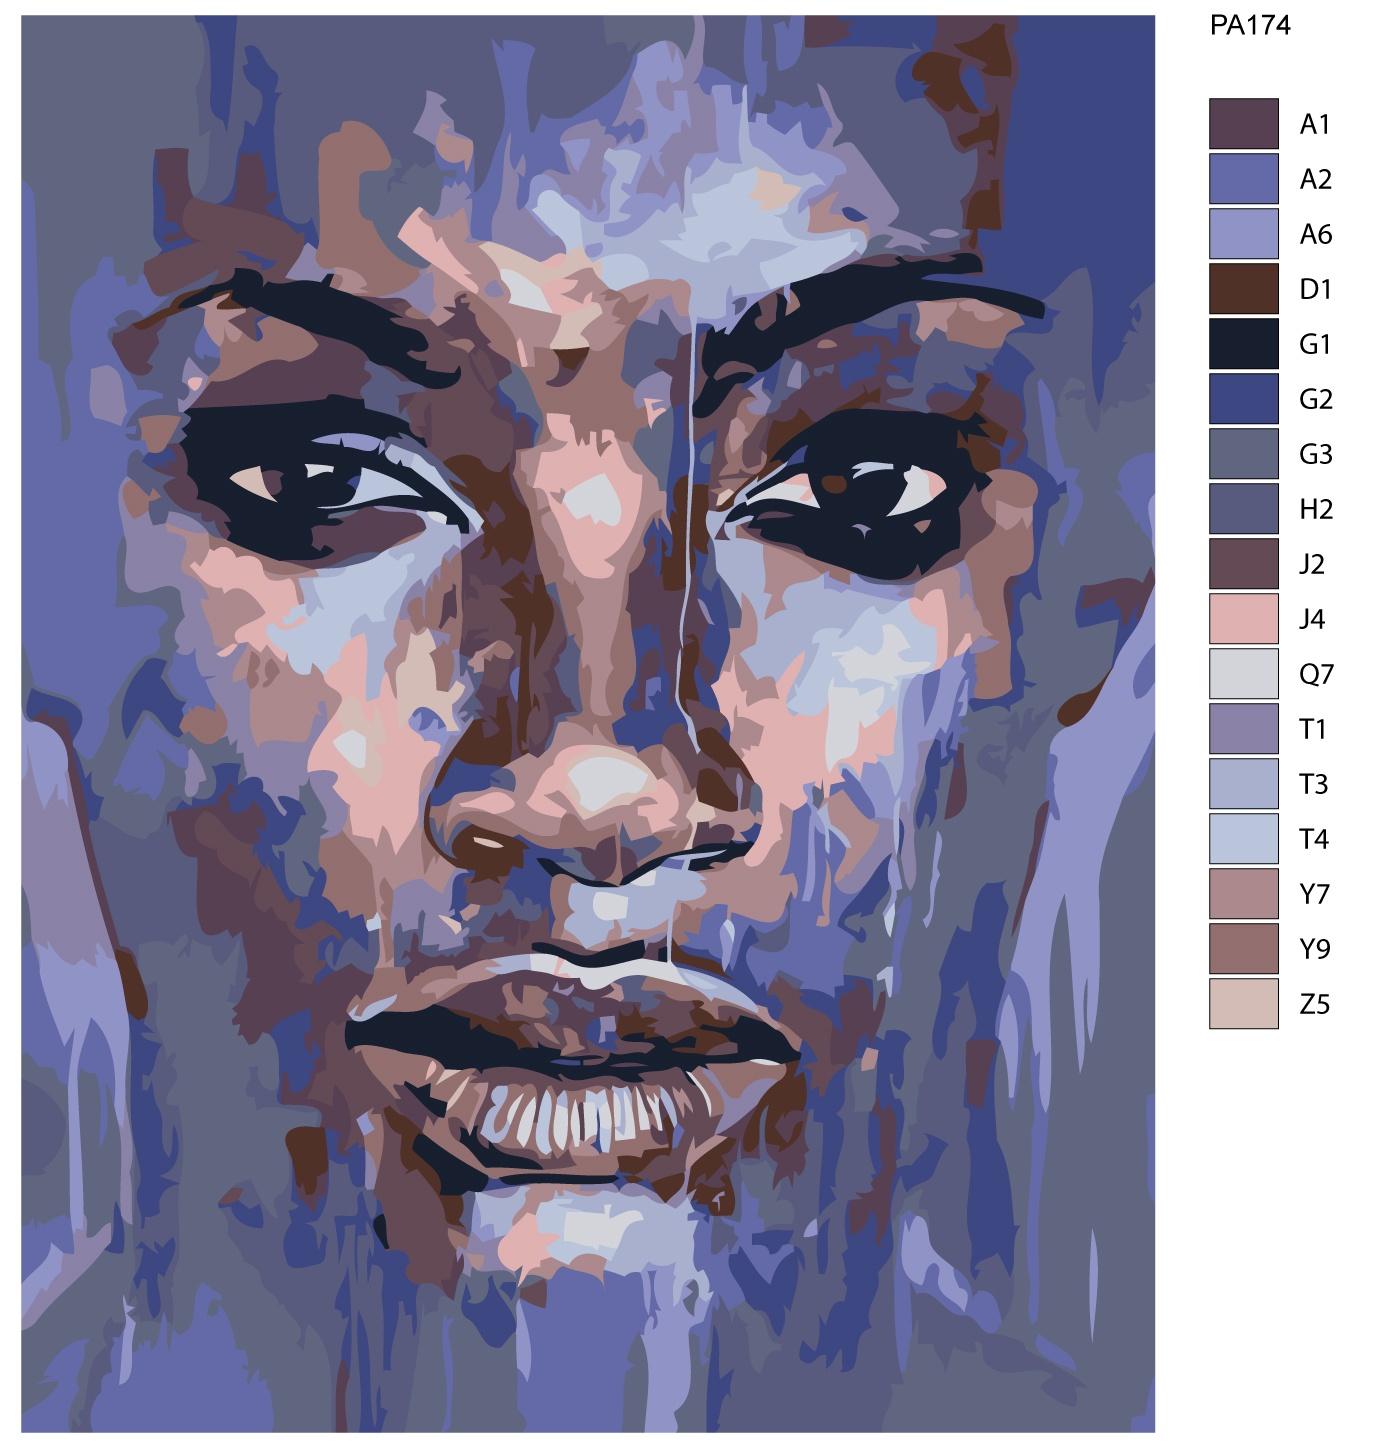 Картина по номерам, 80 x 100 см, PA174